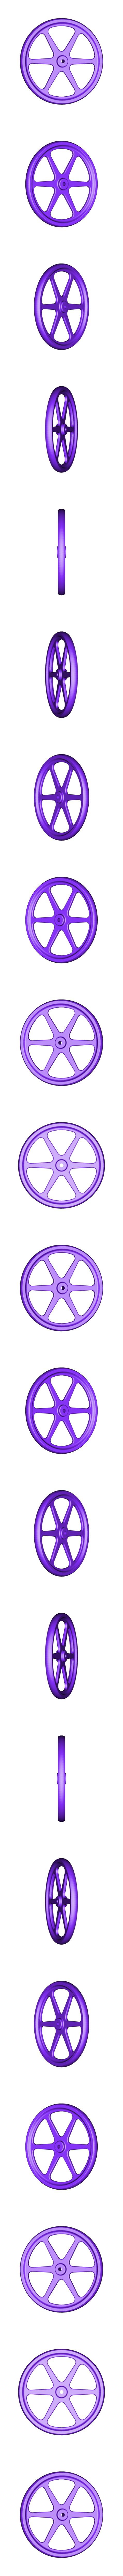 Wheel.STL Download free STL file Automata-4 Ben rides around the clock • 3D printer template, woodenclocks